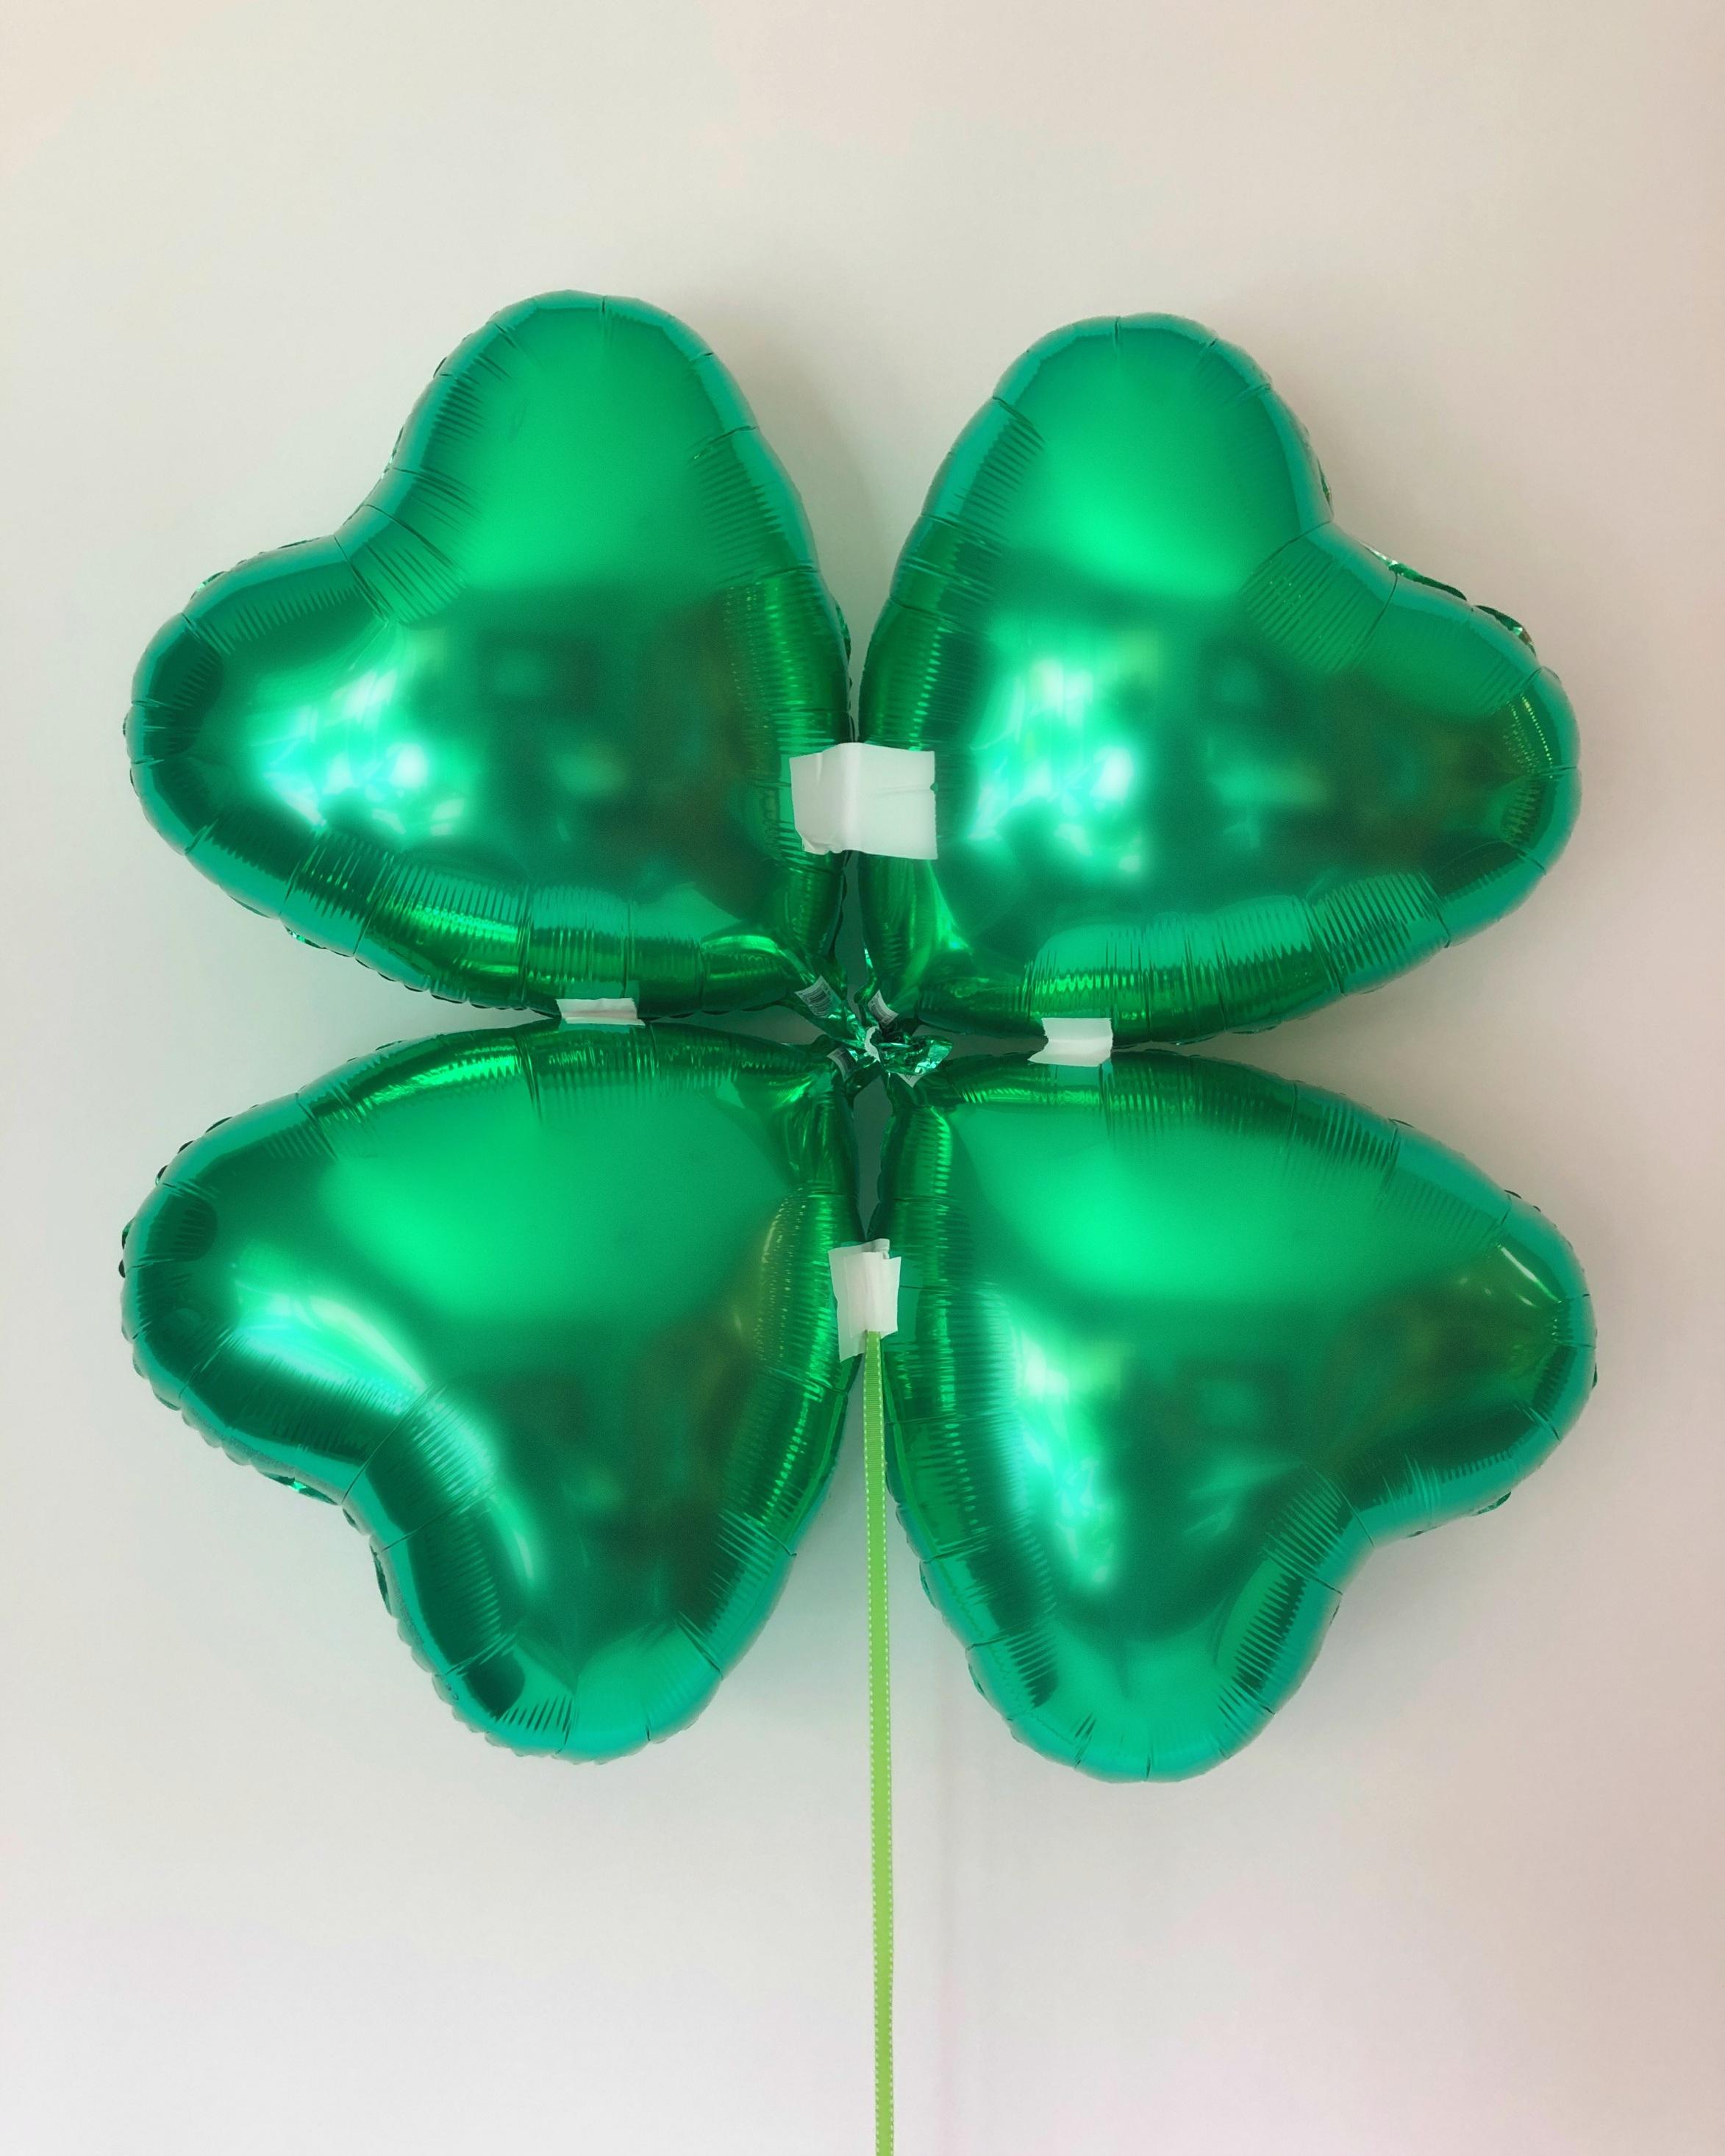 clover-balloon-back.jpg